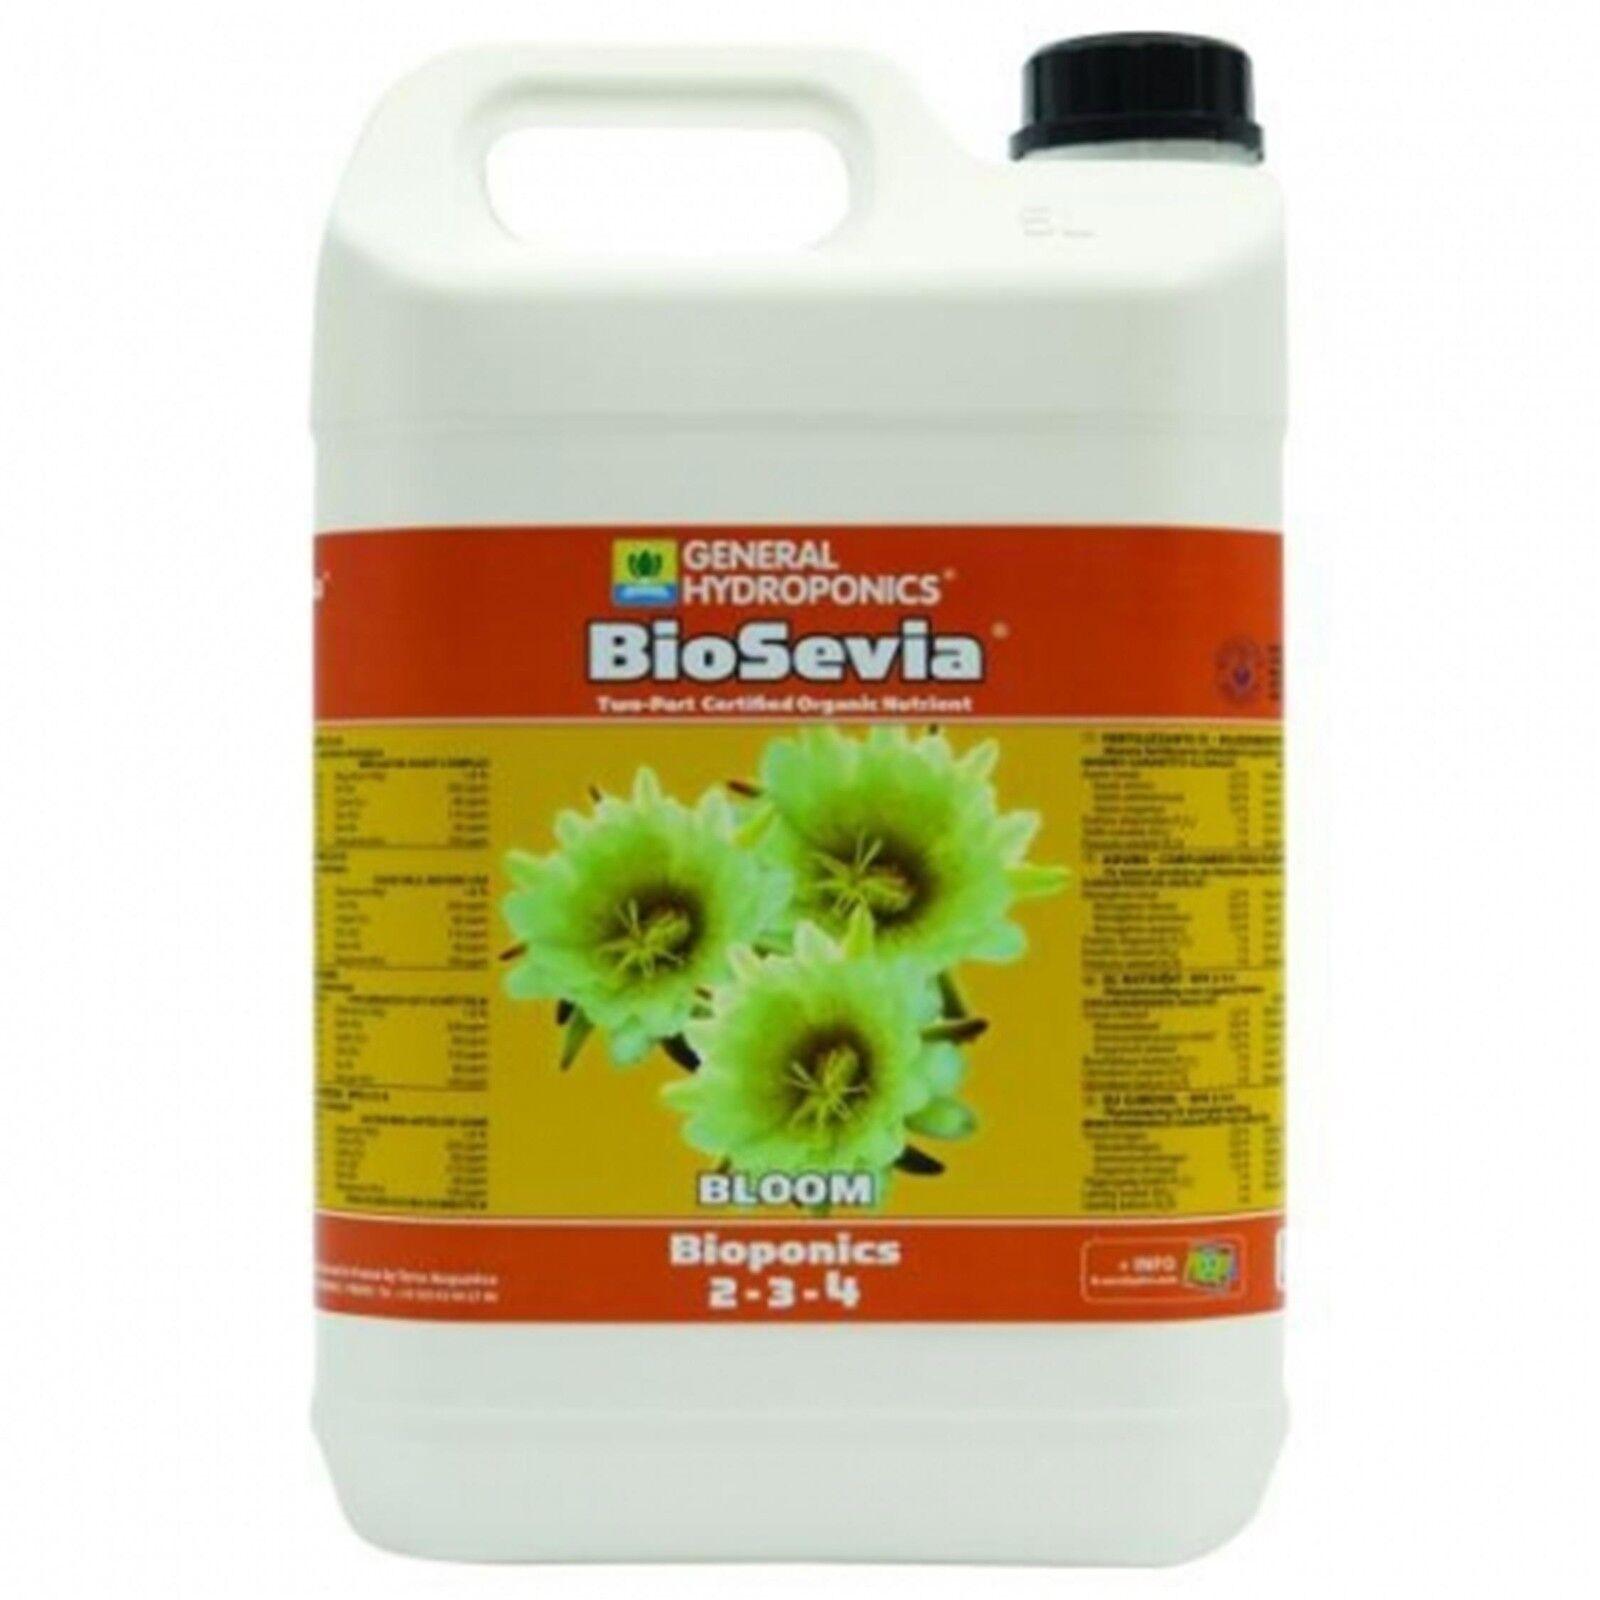 10 Liter GHE BioSevia Bloom biologischer Hydroponik Dünger Blütephase Bloom Grow